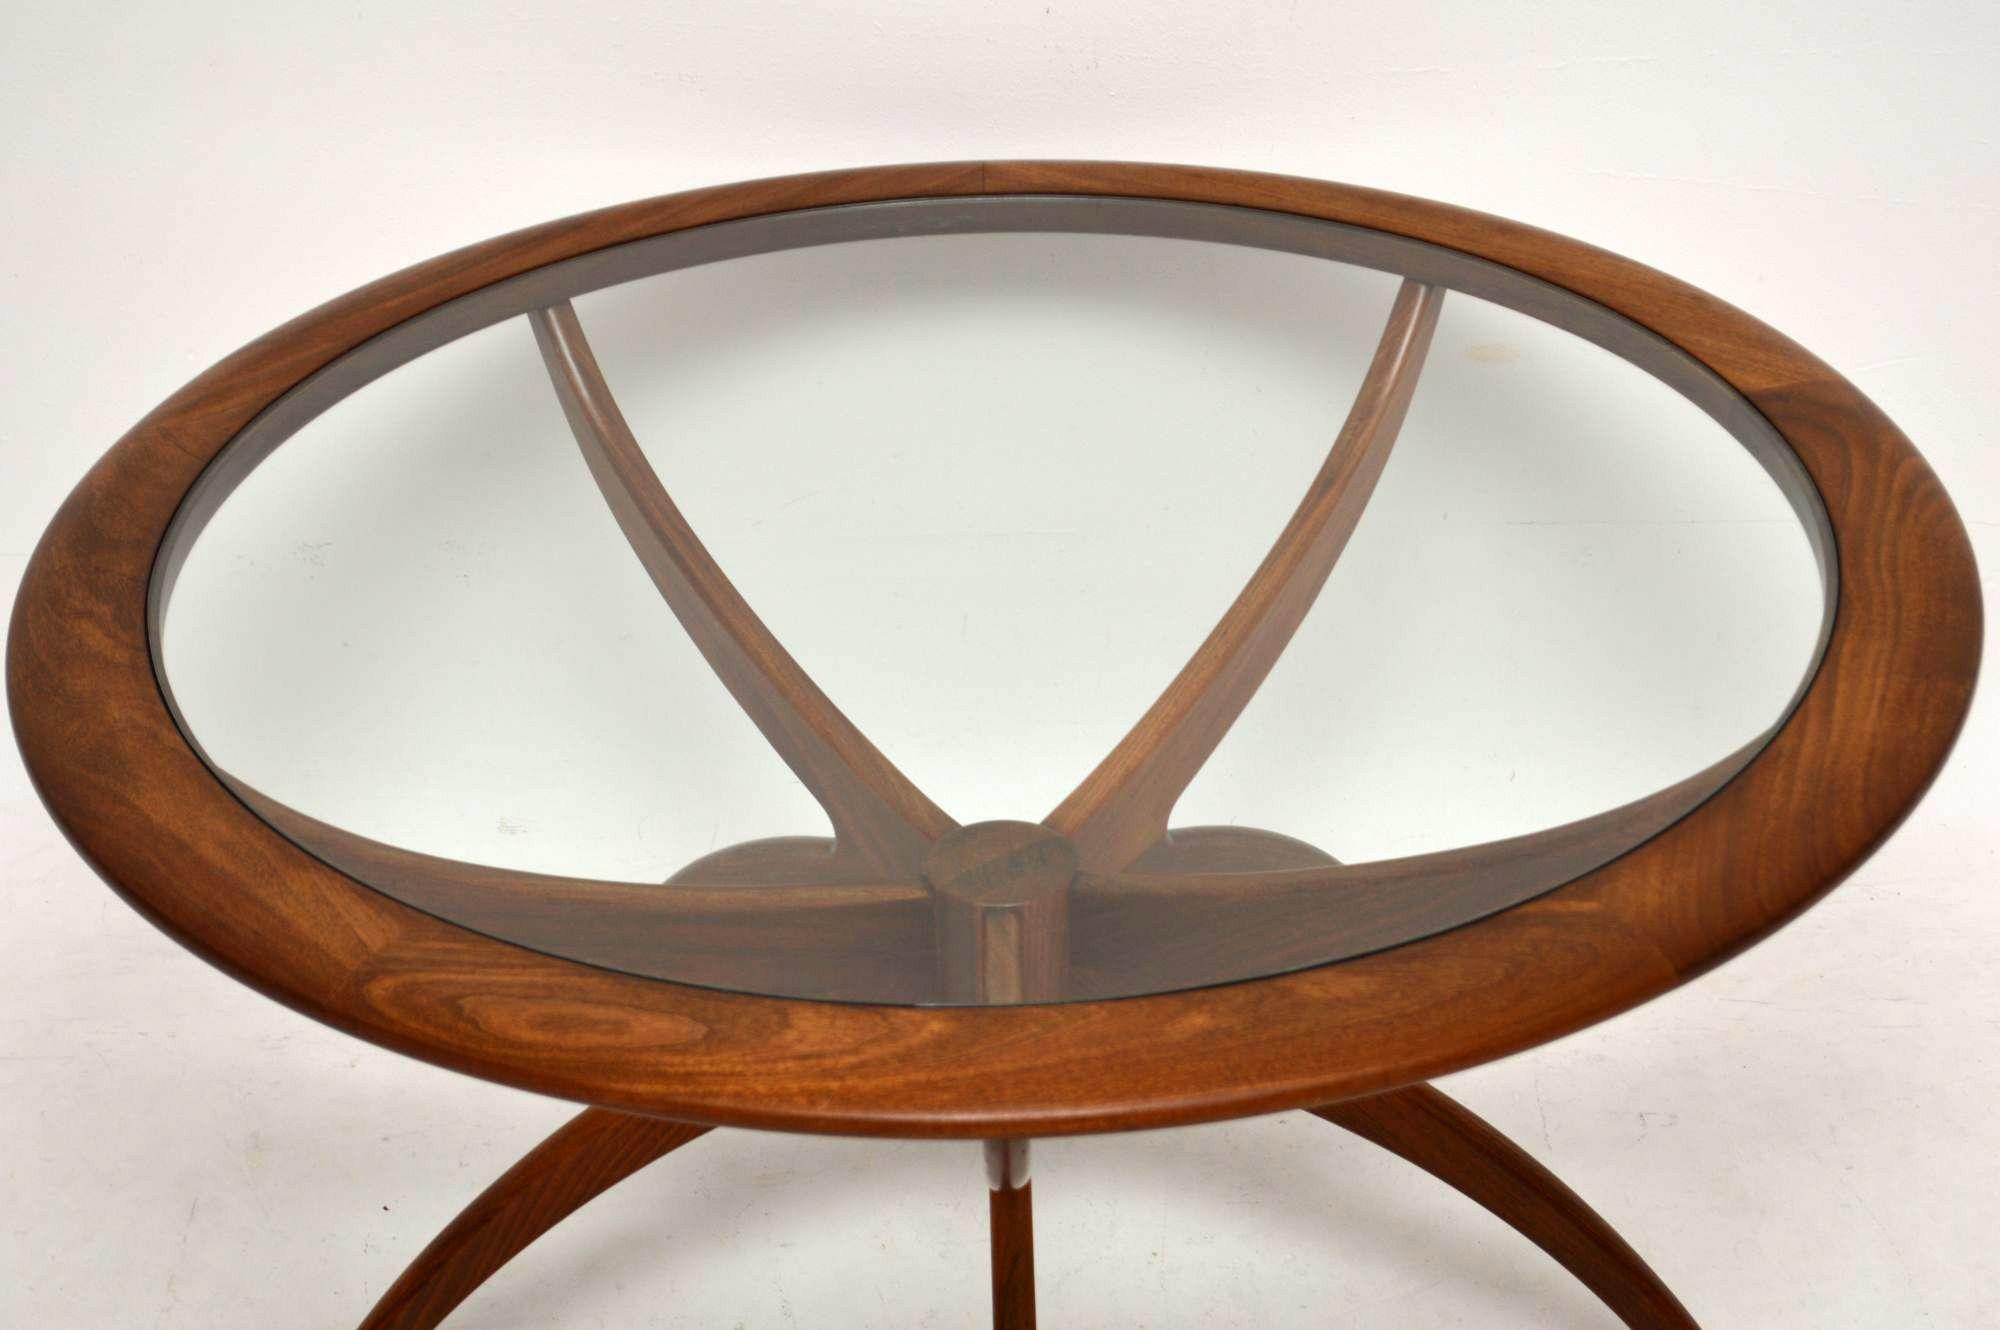 1960 S Vintage Teak Spider Coffee Table By G Plan